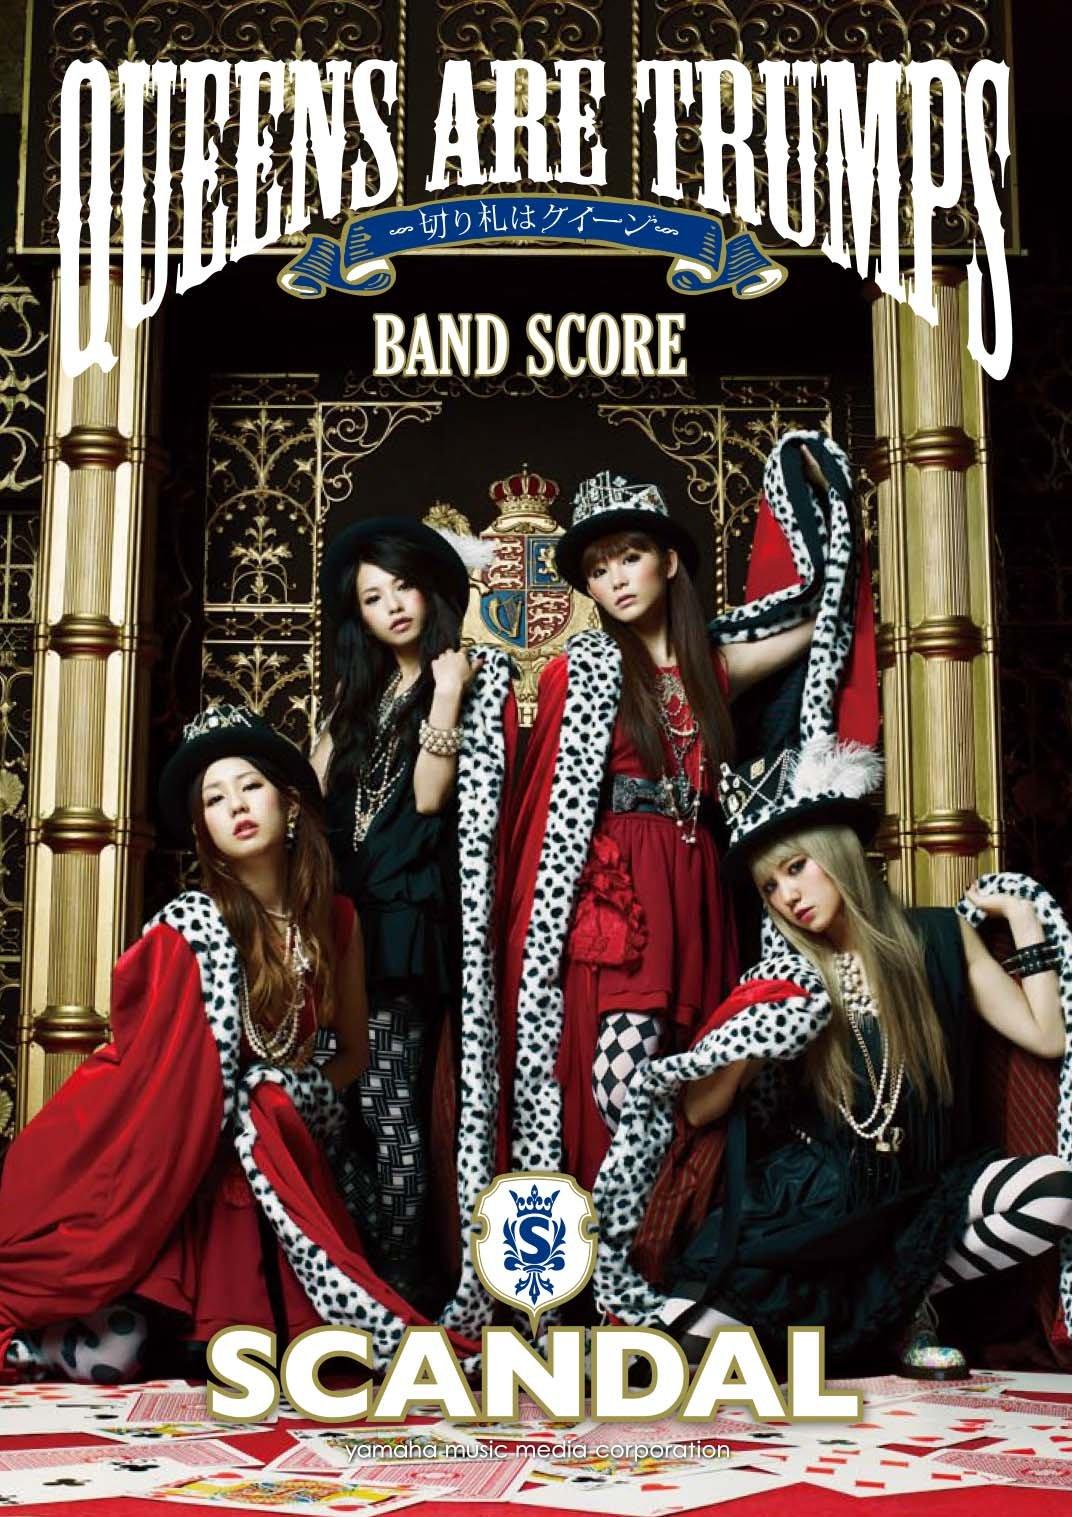 Band Scores Queensaretrumpsbandscore